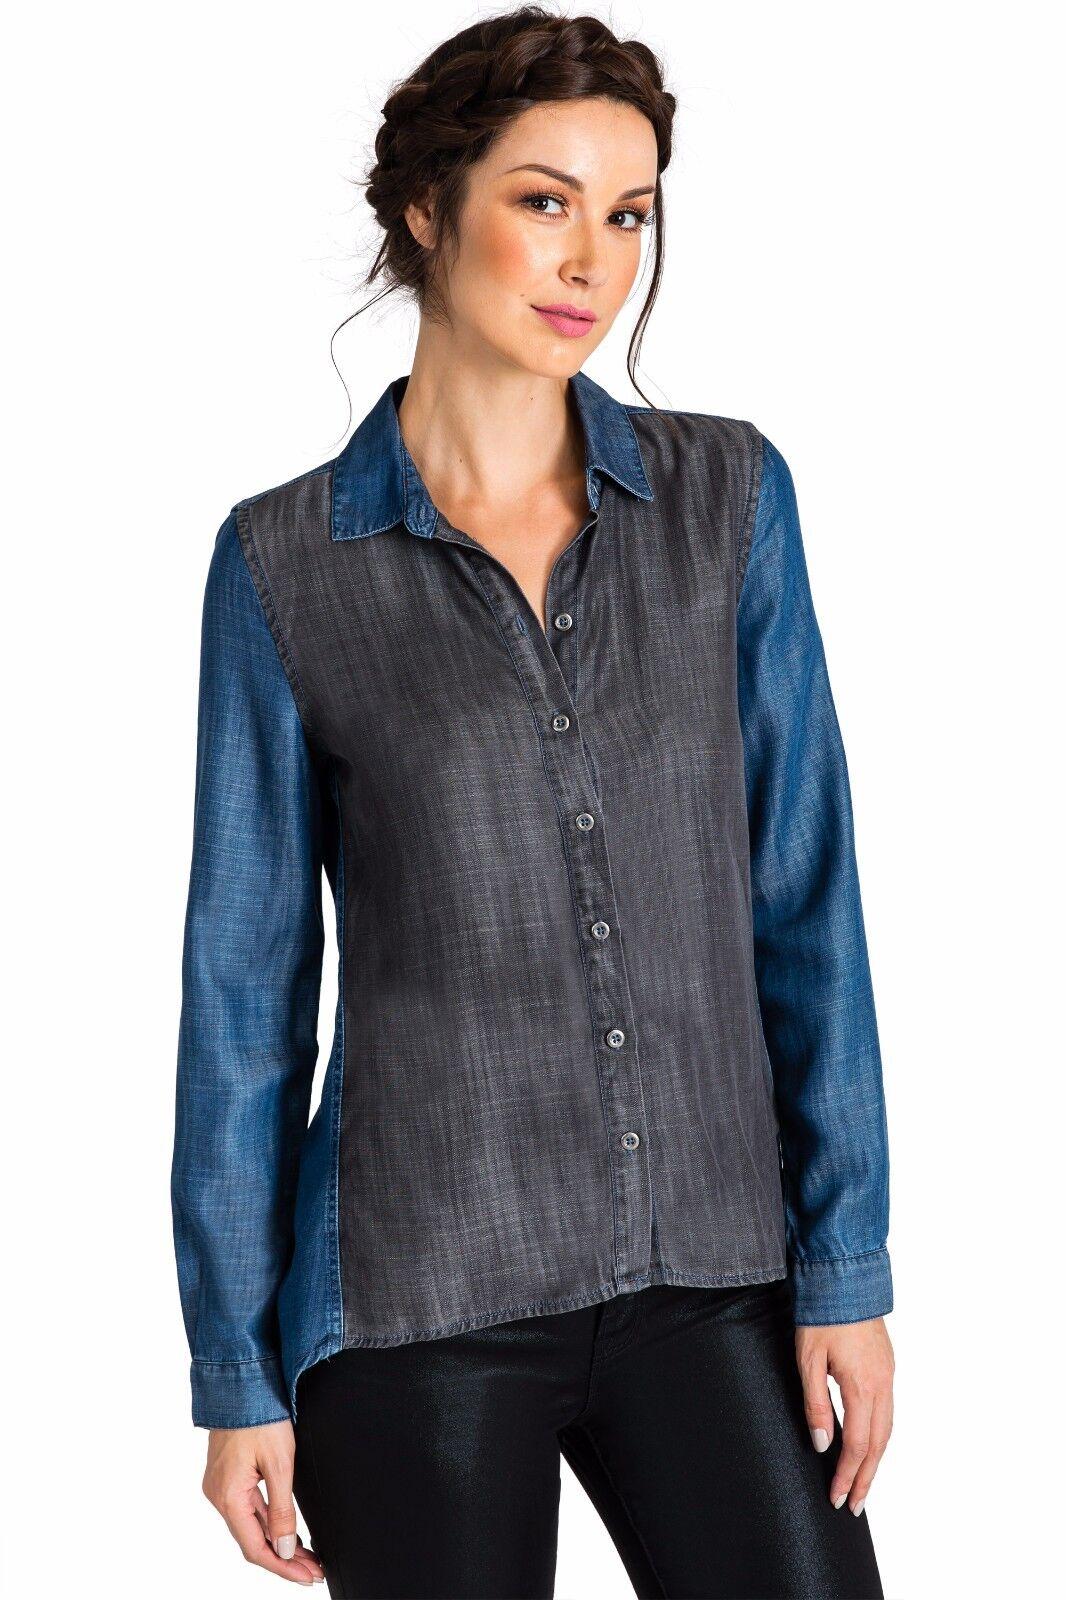 Standards & Practices Modern Woherren Two Tone Tencel Button Down High Low Shirt